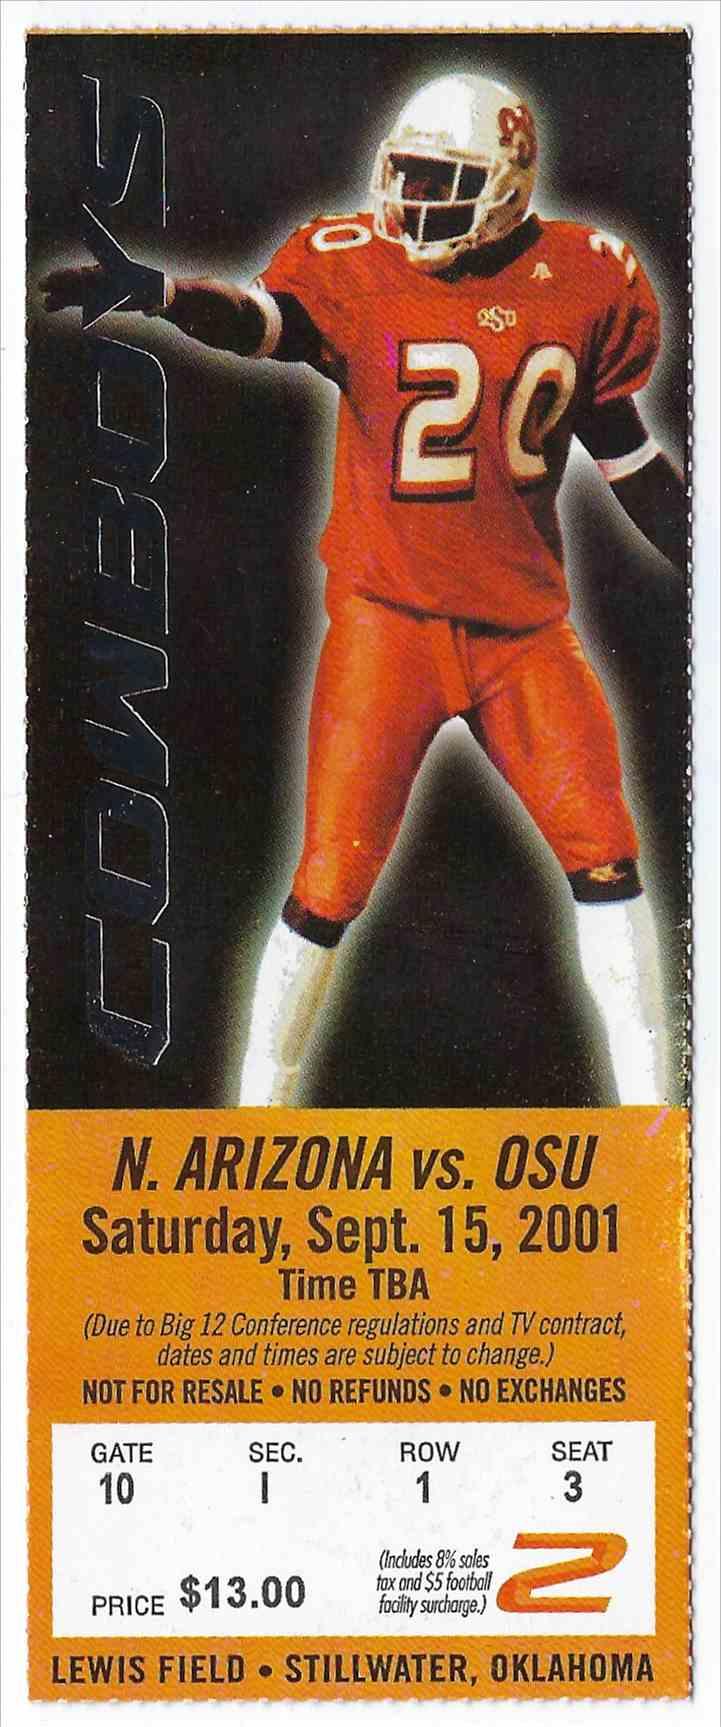 2001 College Football Ticket Stub Northern Arizona Vs Oklahoma State card front image